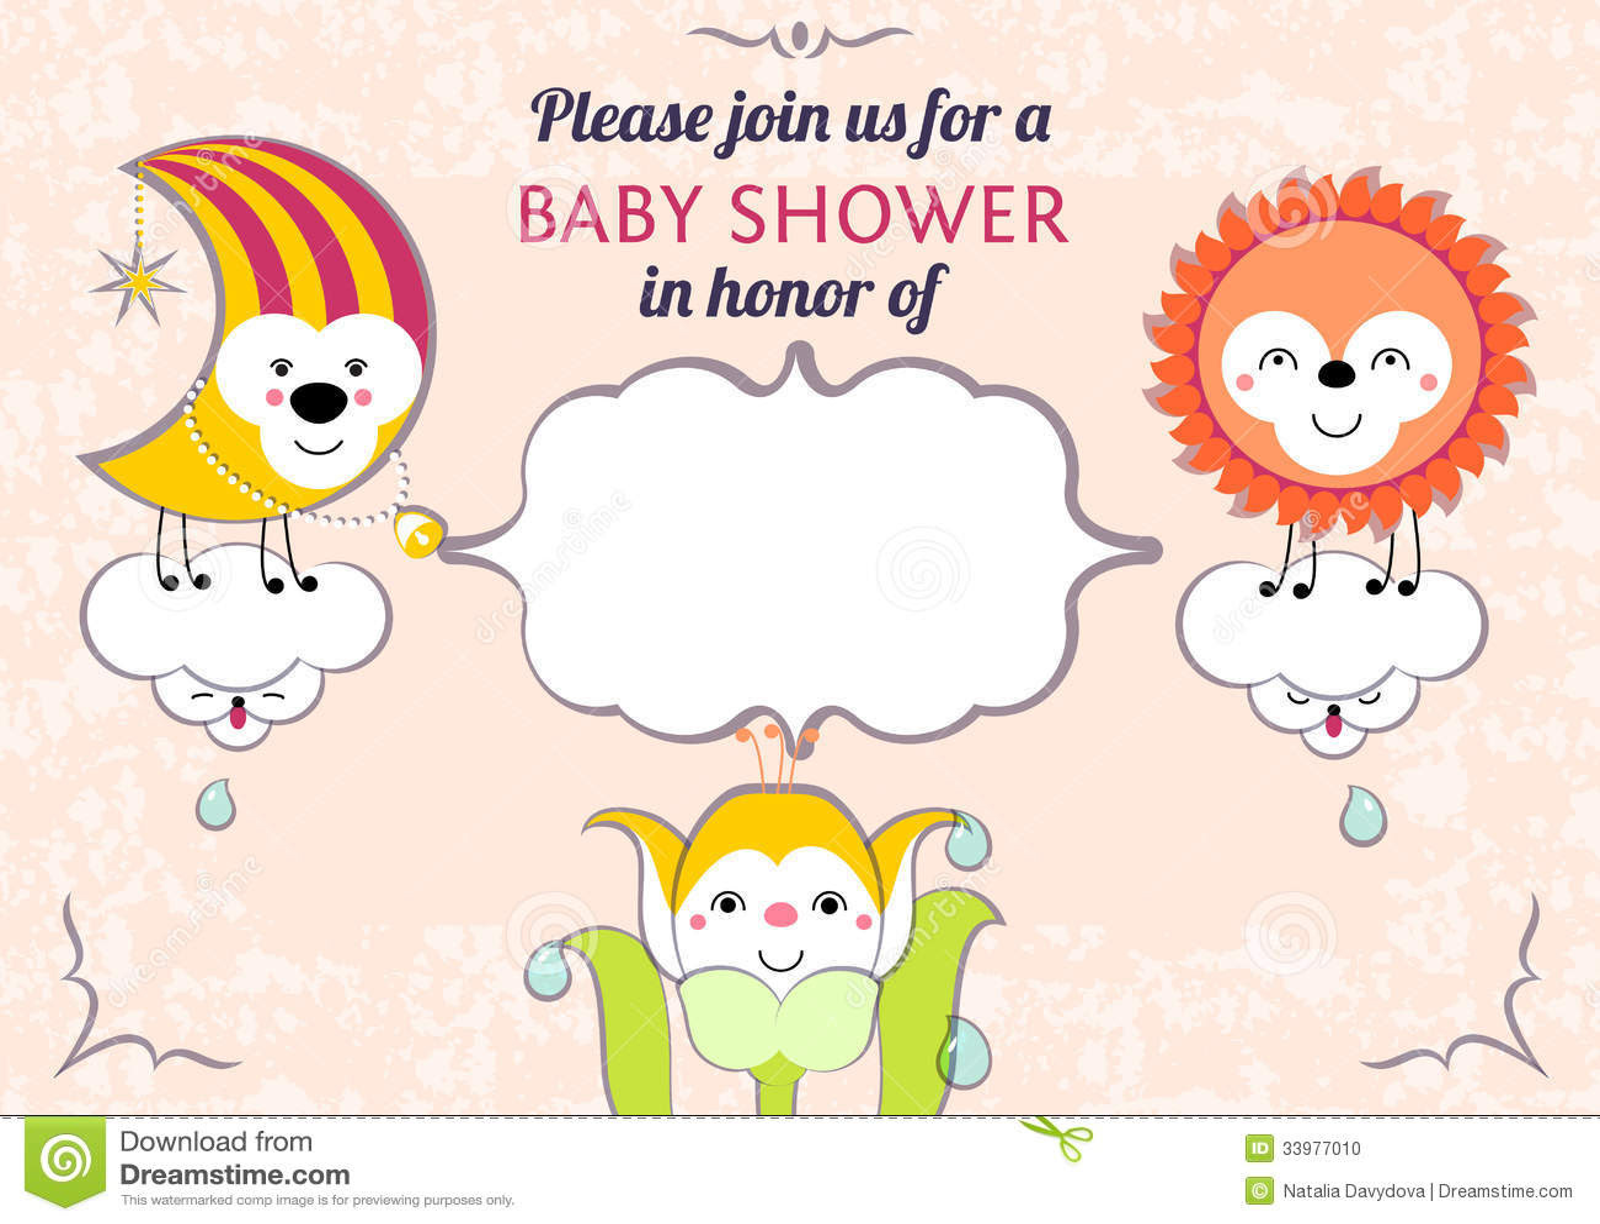 Baby Shower Invitation Card Editable Template Funn Stock Photo ...